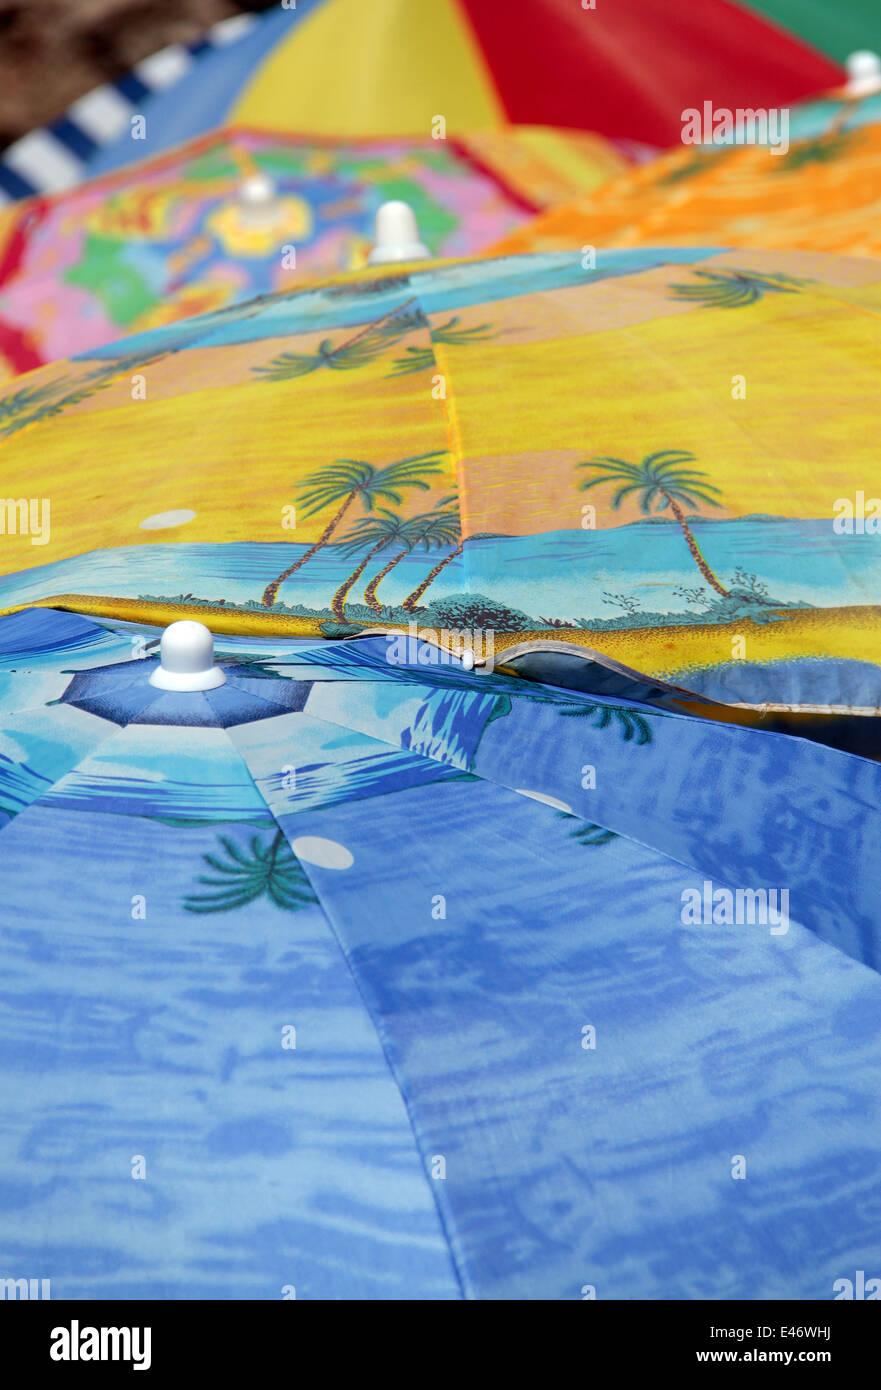 Sunshades - Stock Image